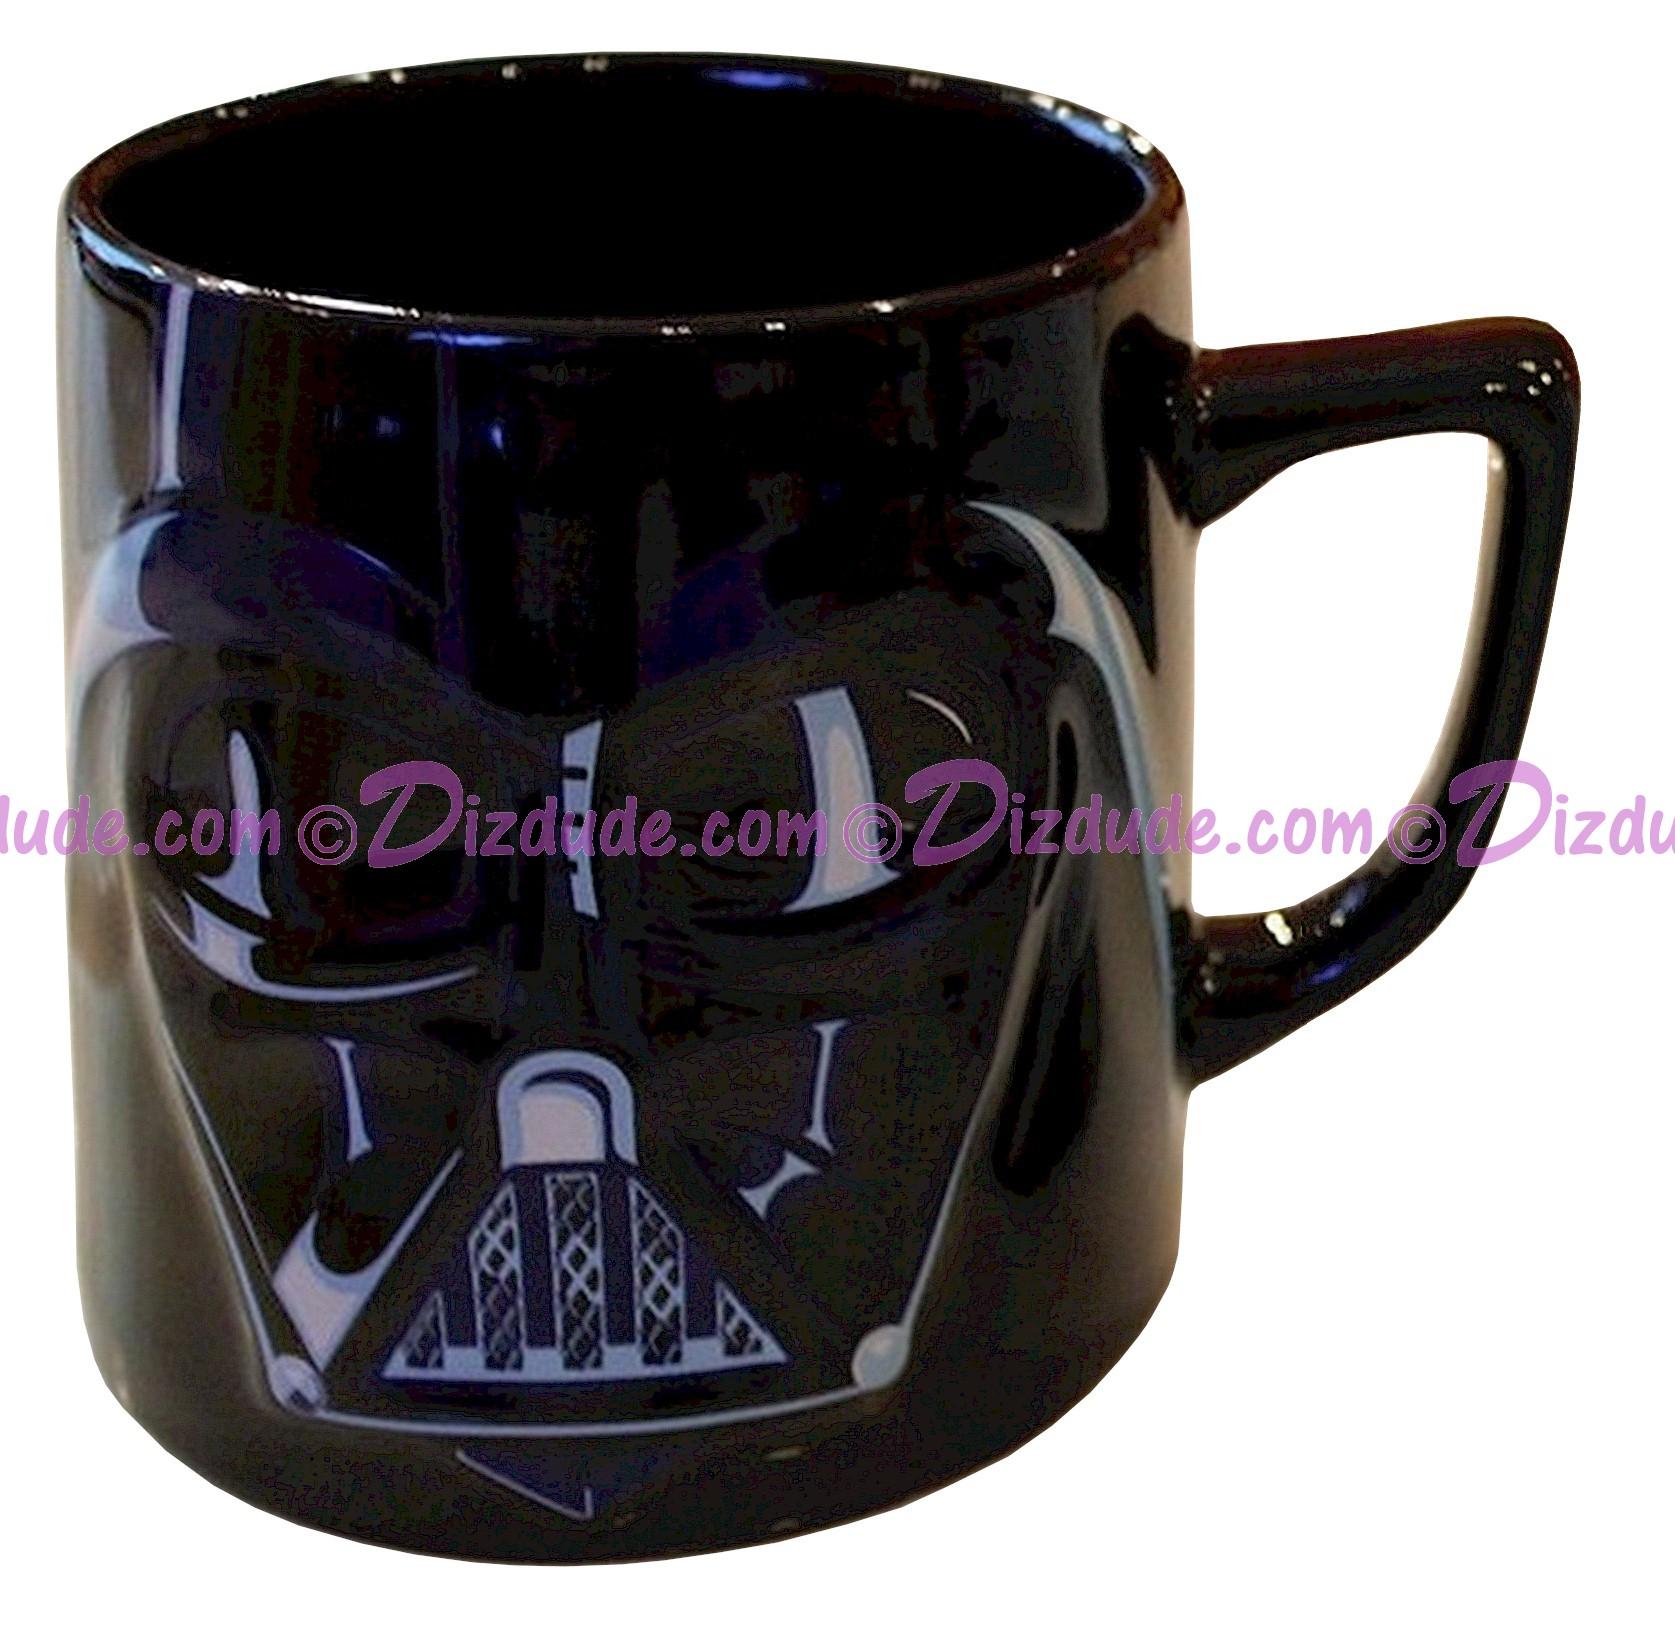 Darth Vader Disney Star Wars Character Mug © Dizdude.com